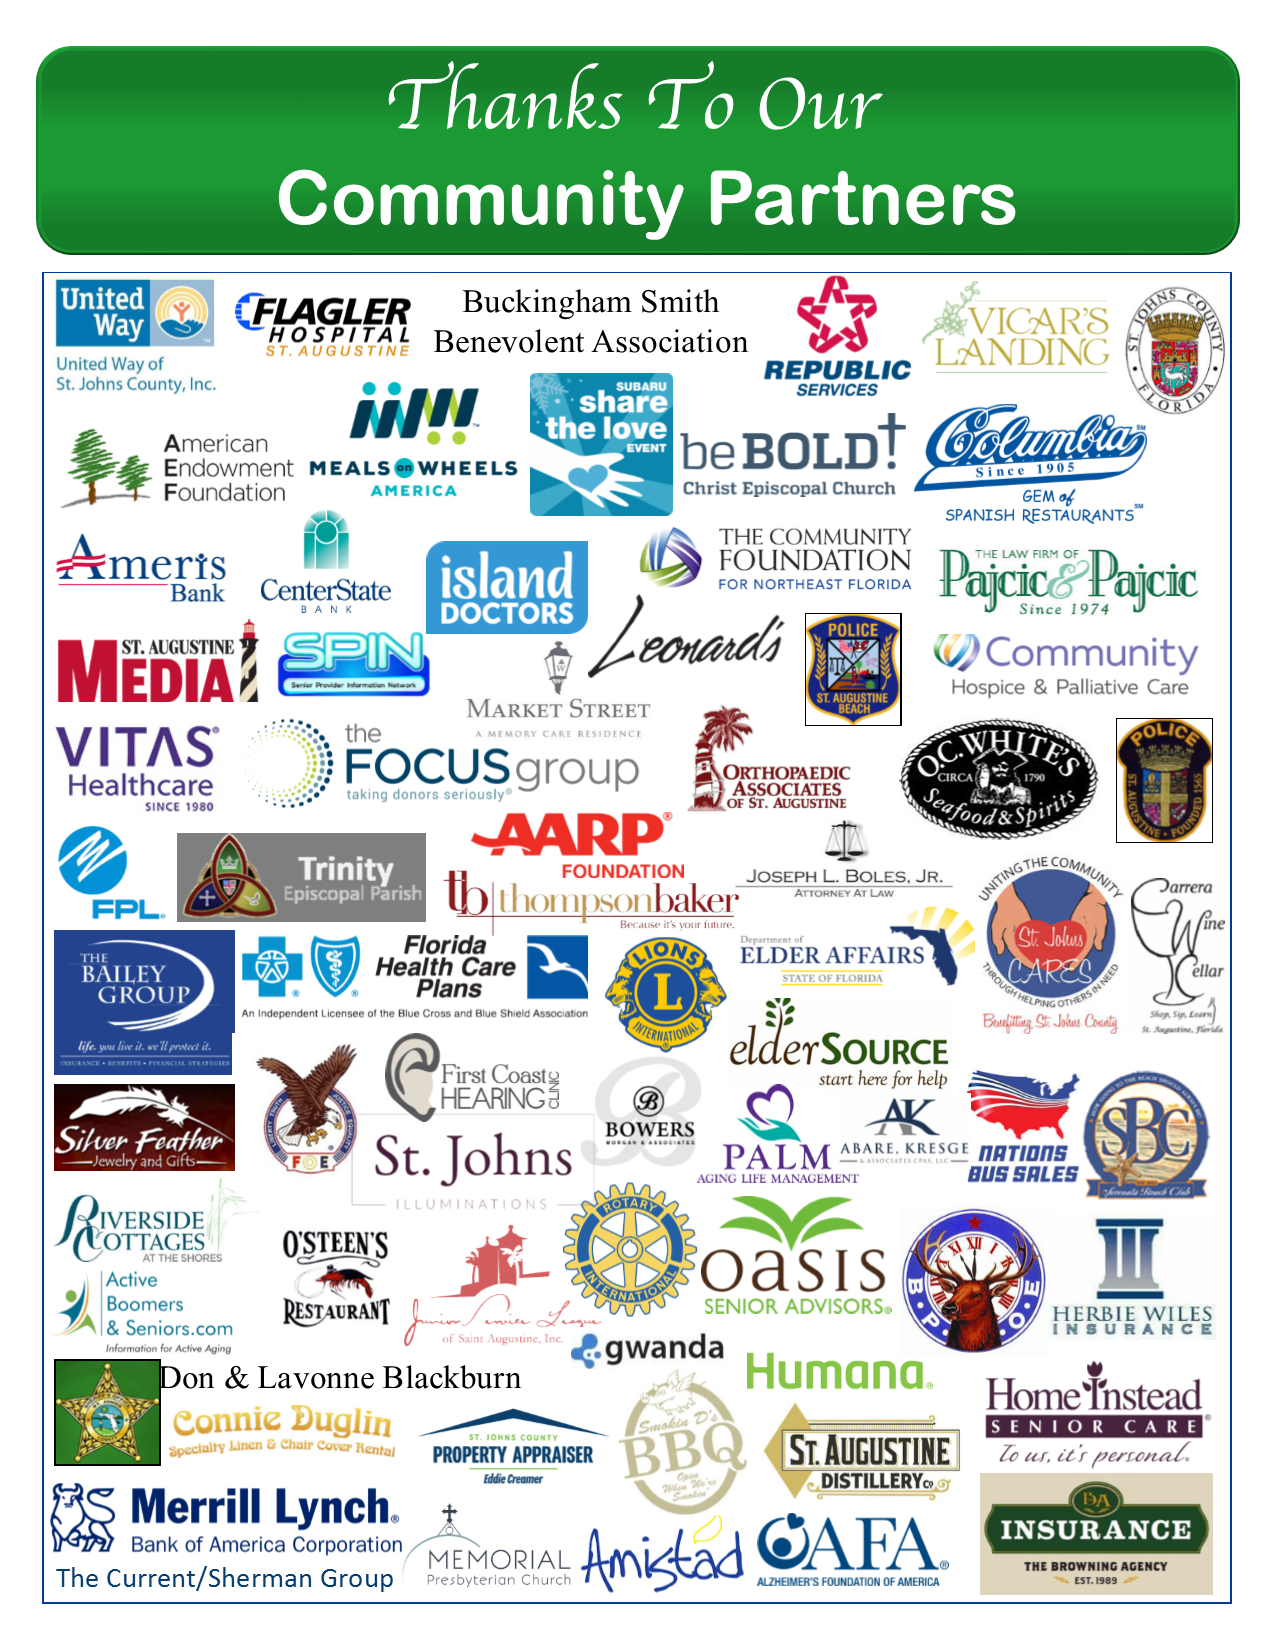 COA's Community Partners